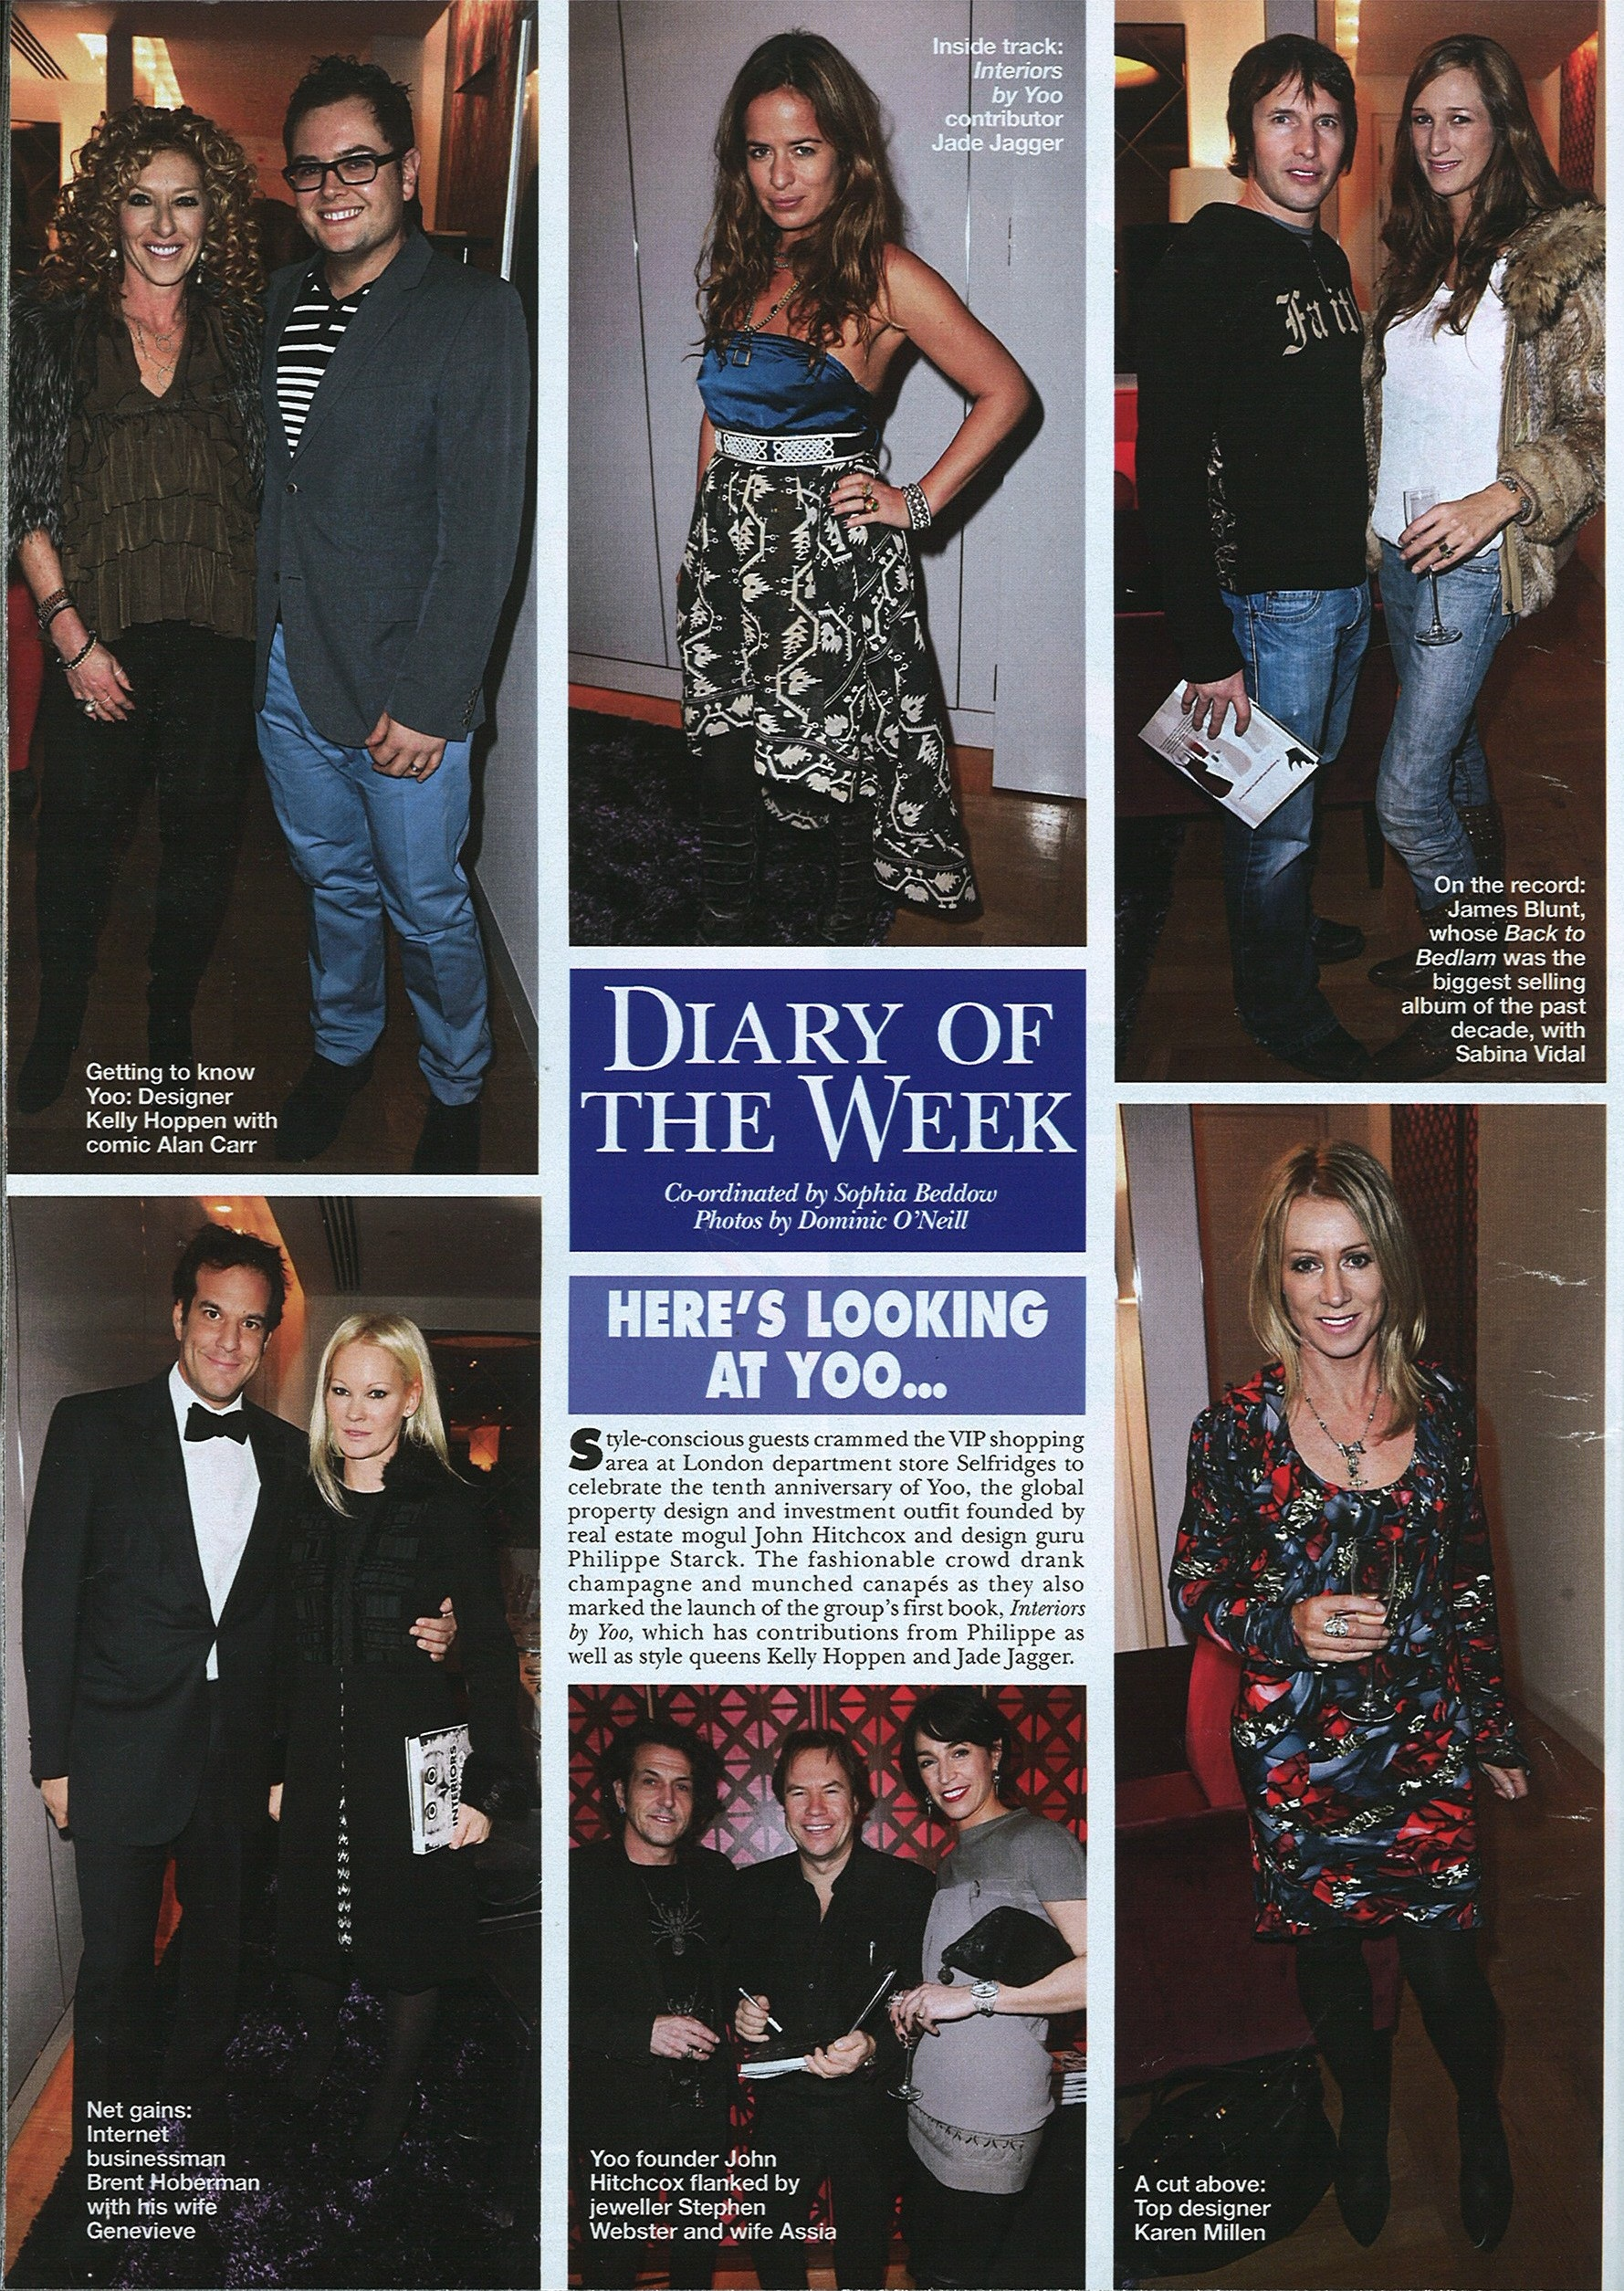 Hello magazine, 11th January 2010 DIARY OF THE WEEK